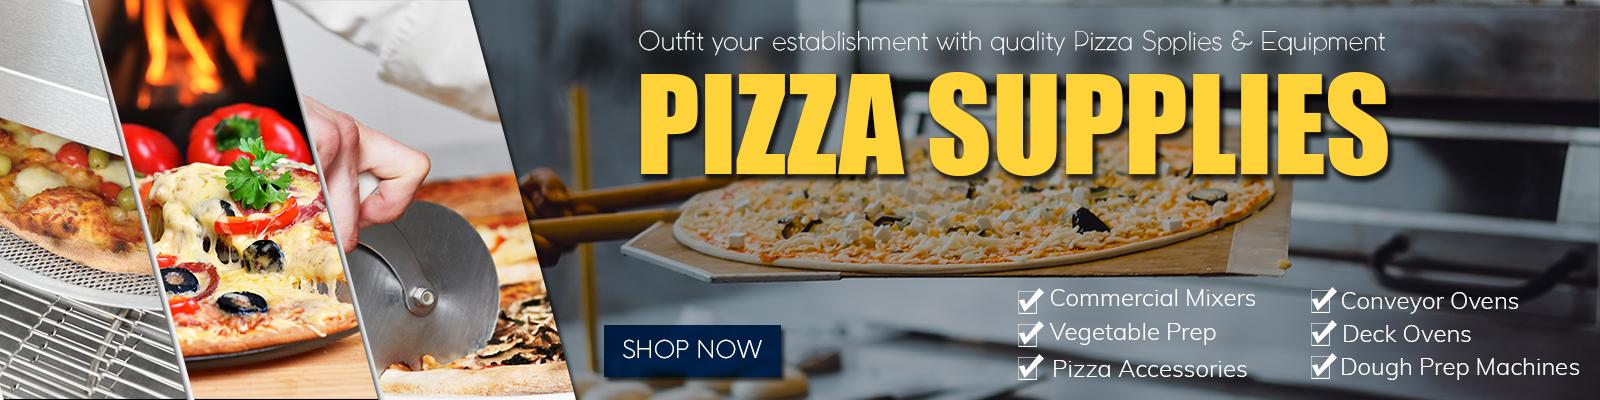 Pizza Equipment Supplies Vancouver, Restaurant Equipment